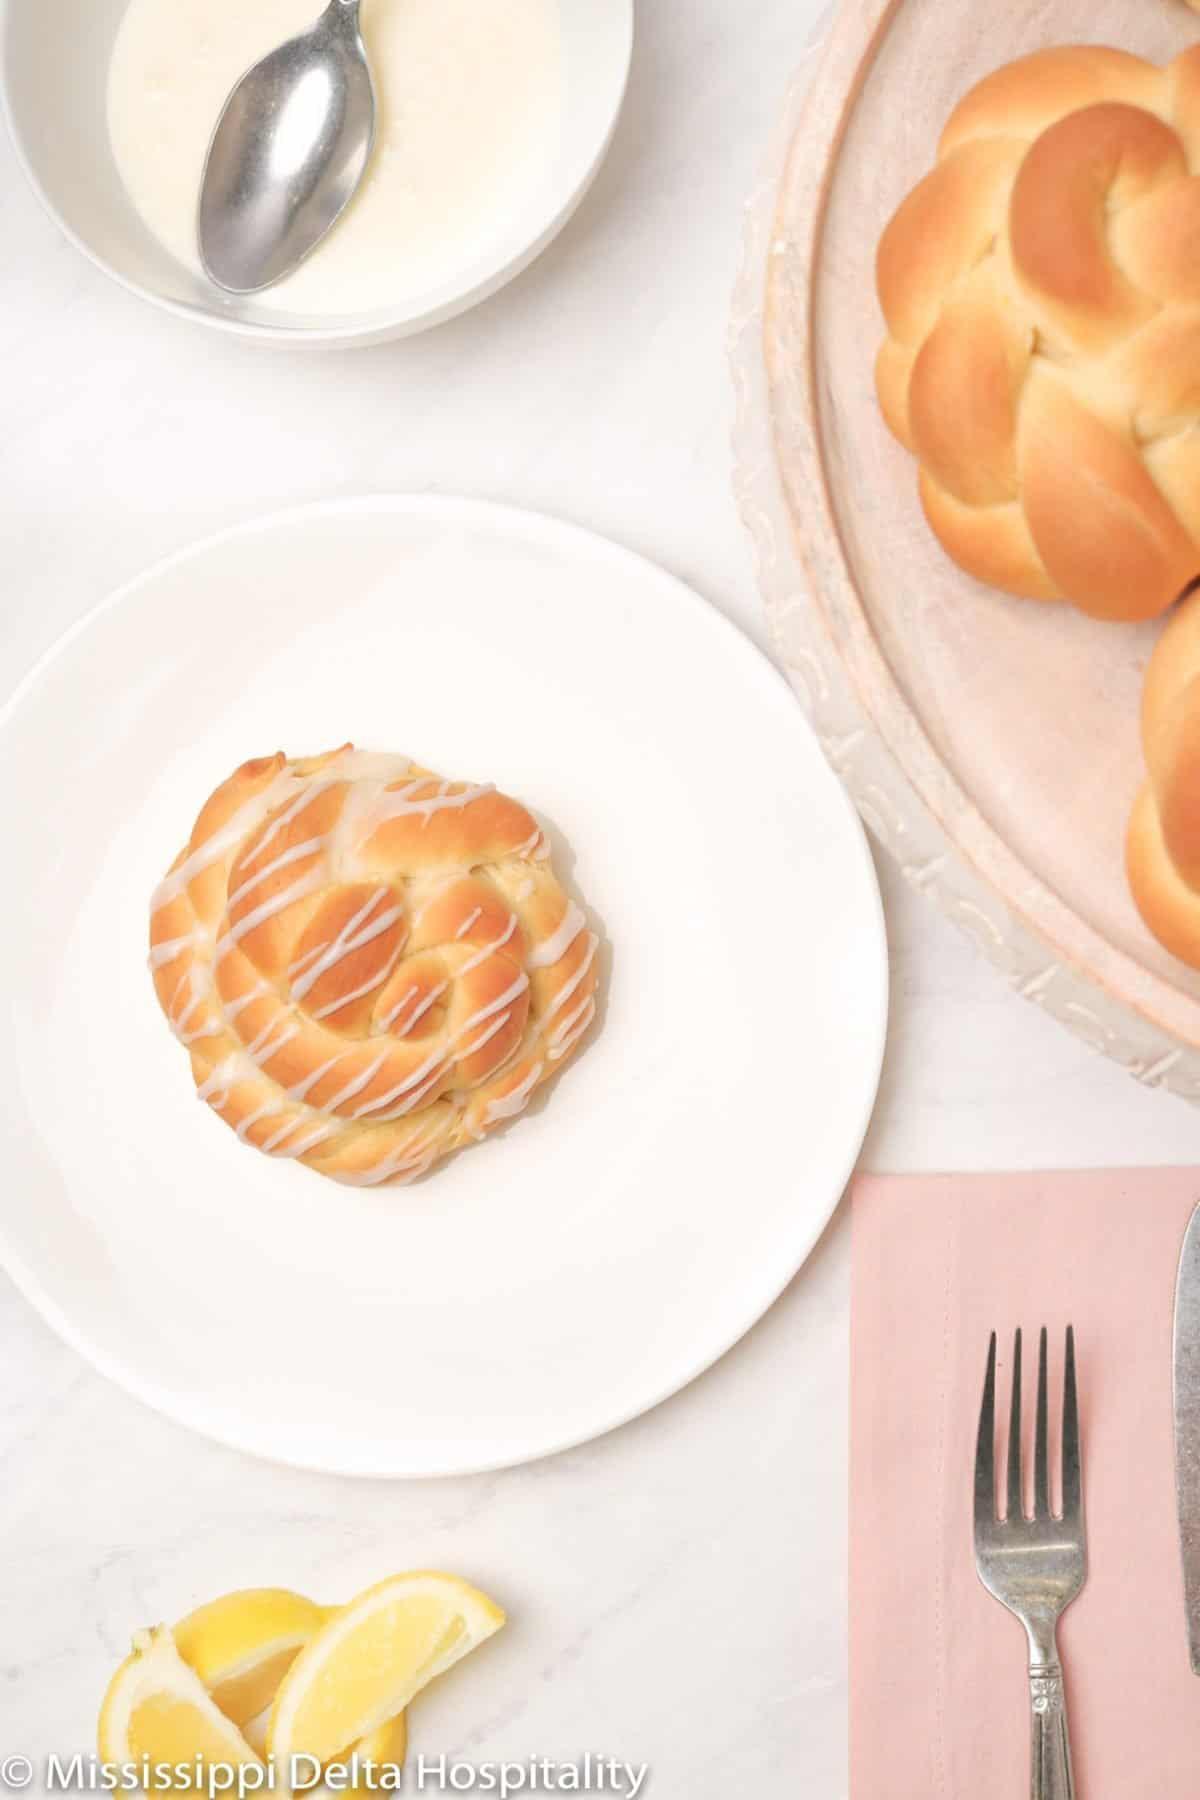 a glazed lemon knot on a white plate with a pink napkin and a fork.